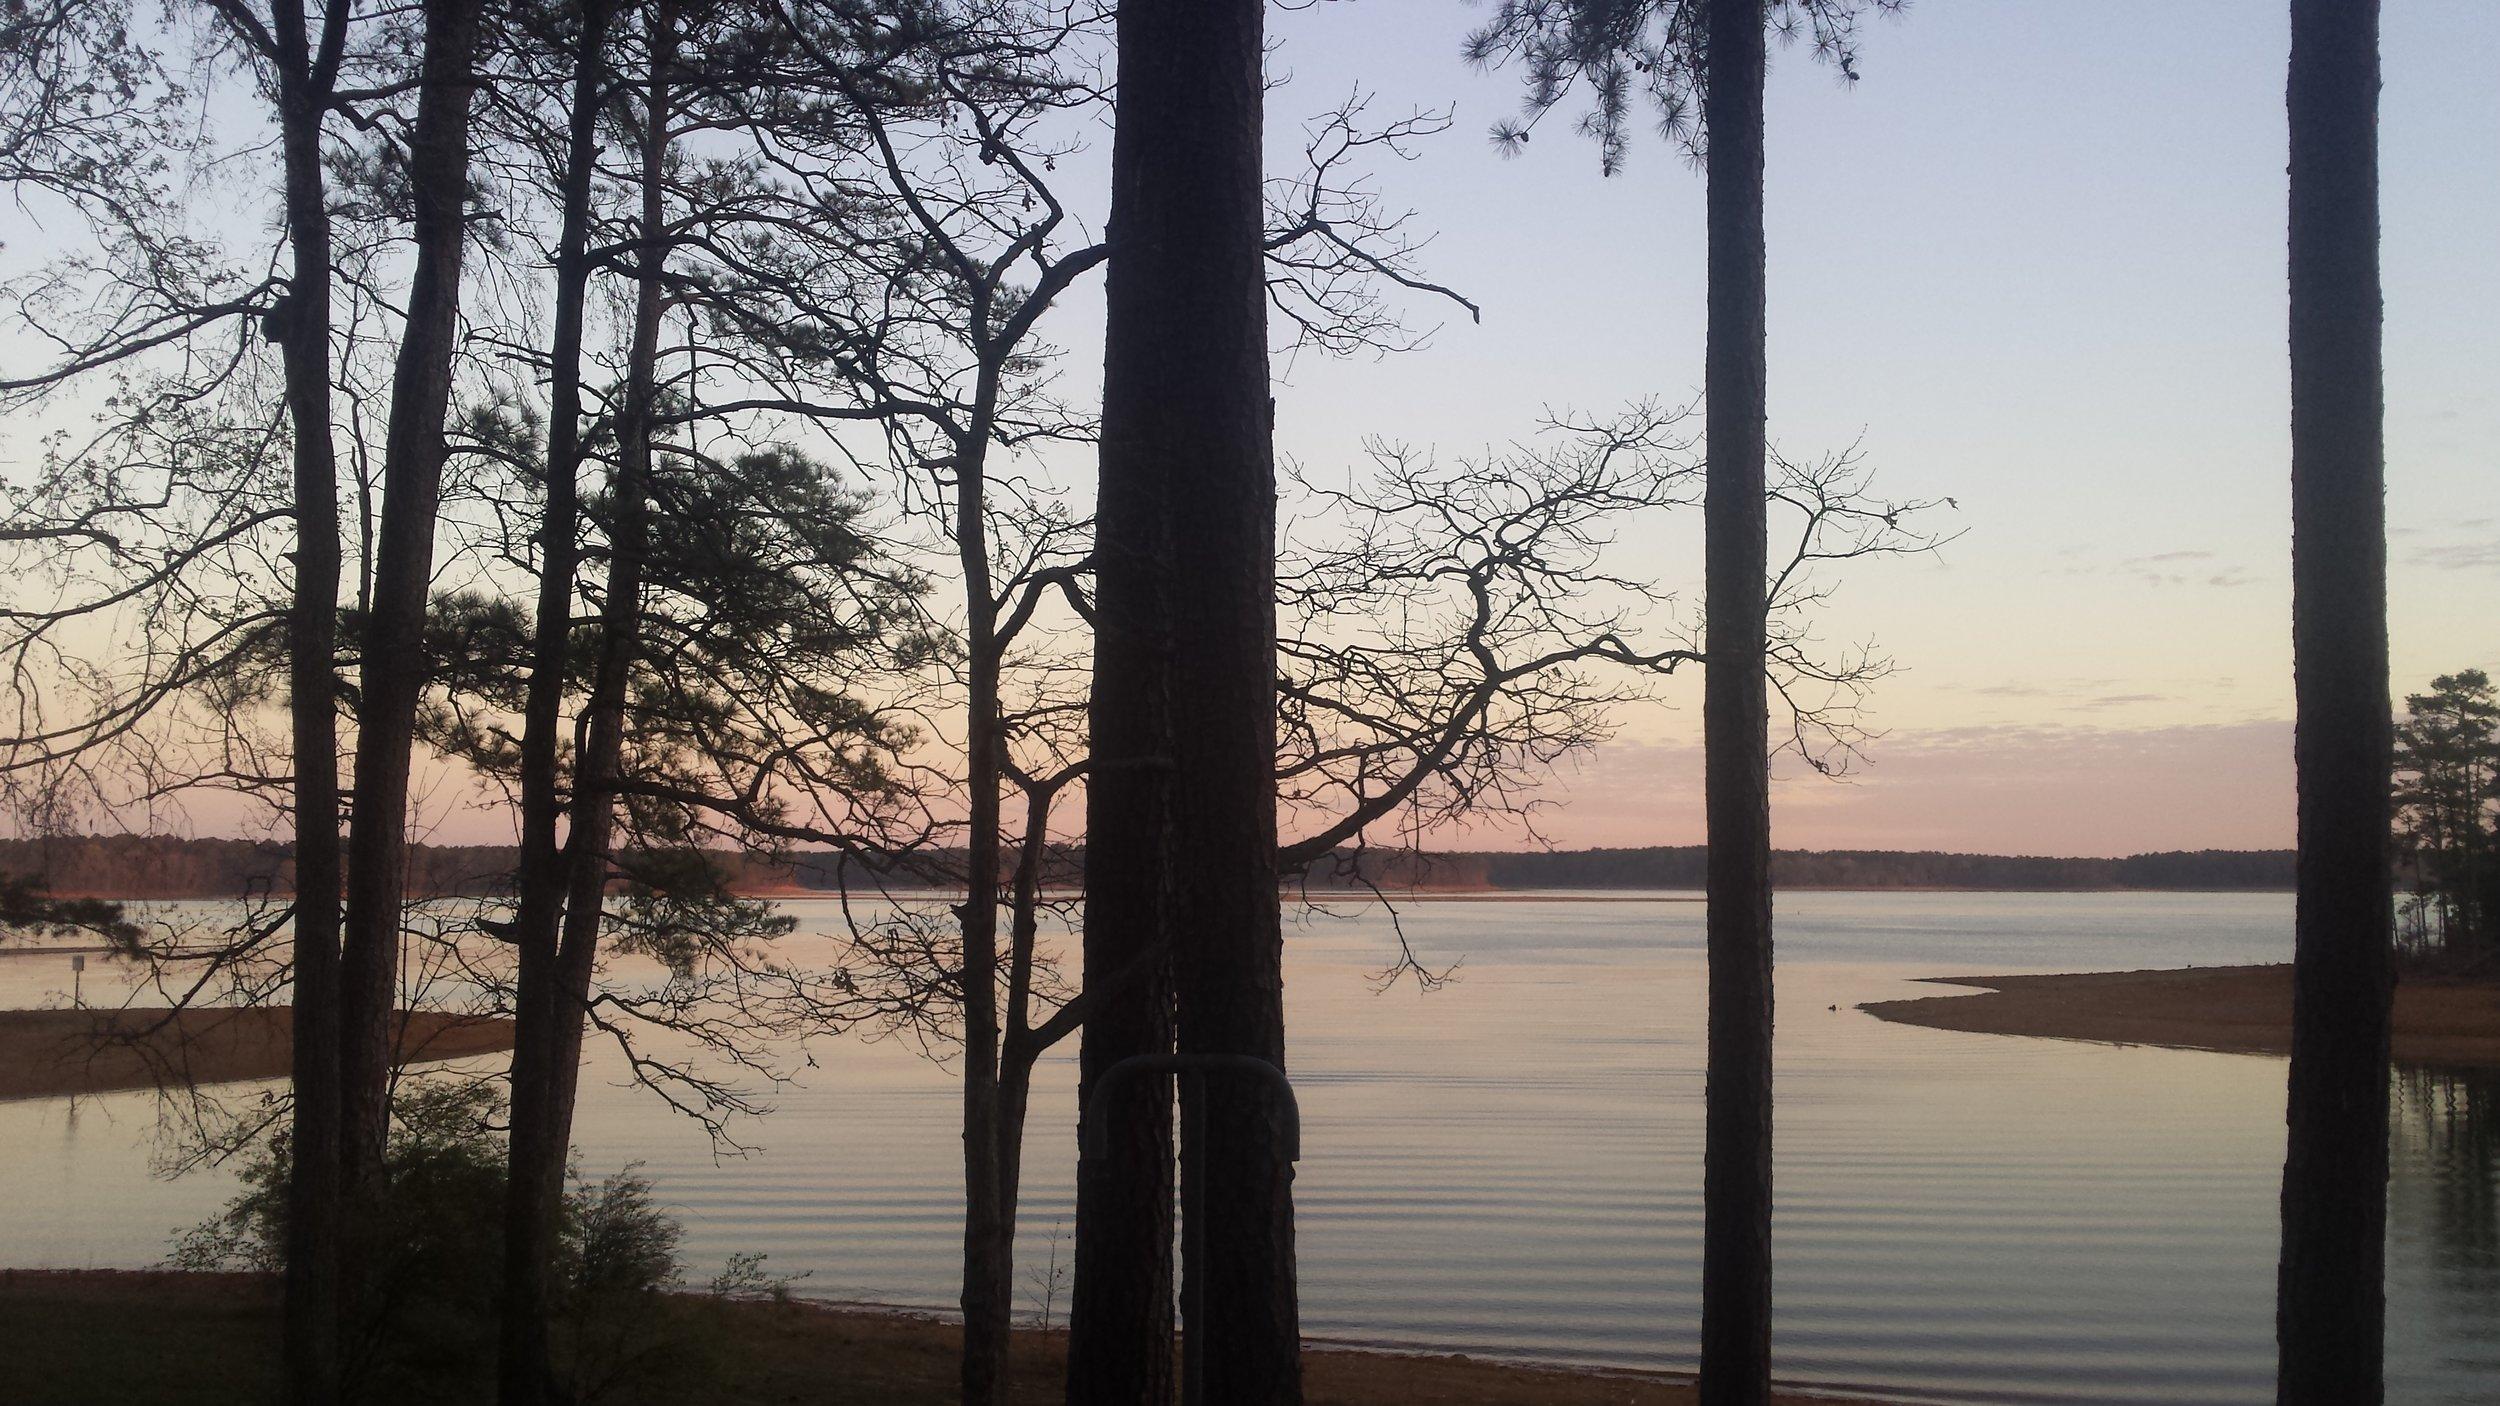 Winter sunset on Clarks Hill Lake, Appling, Georgia